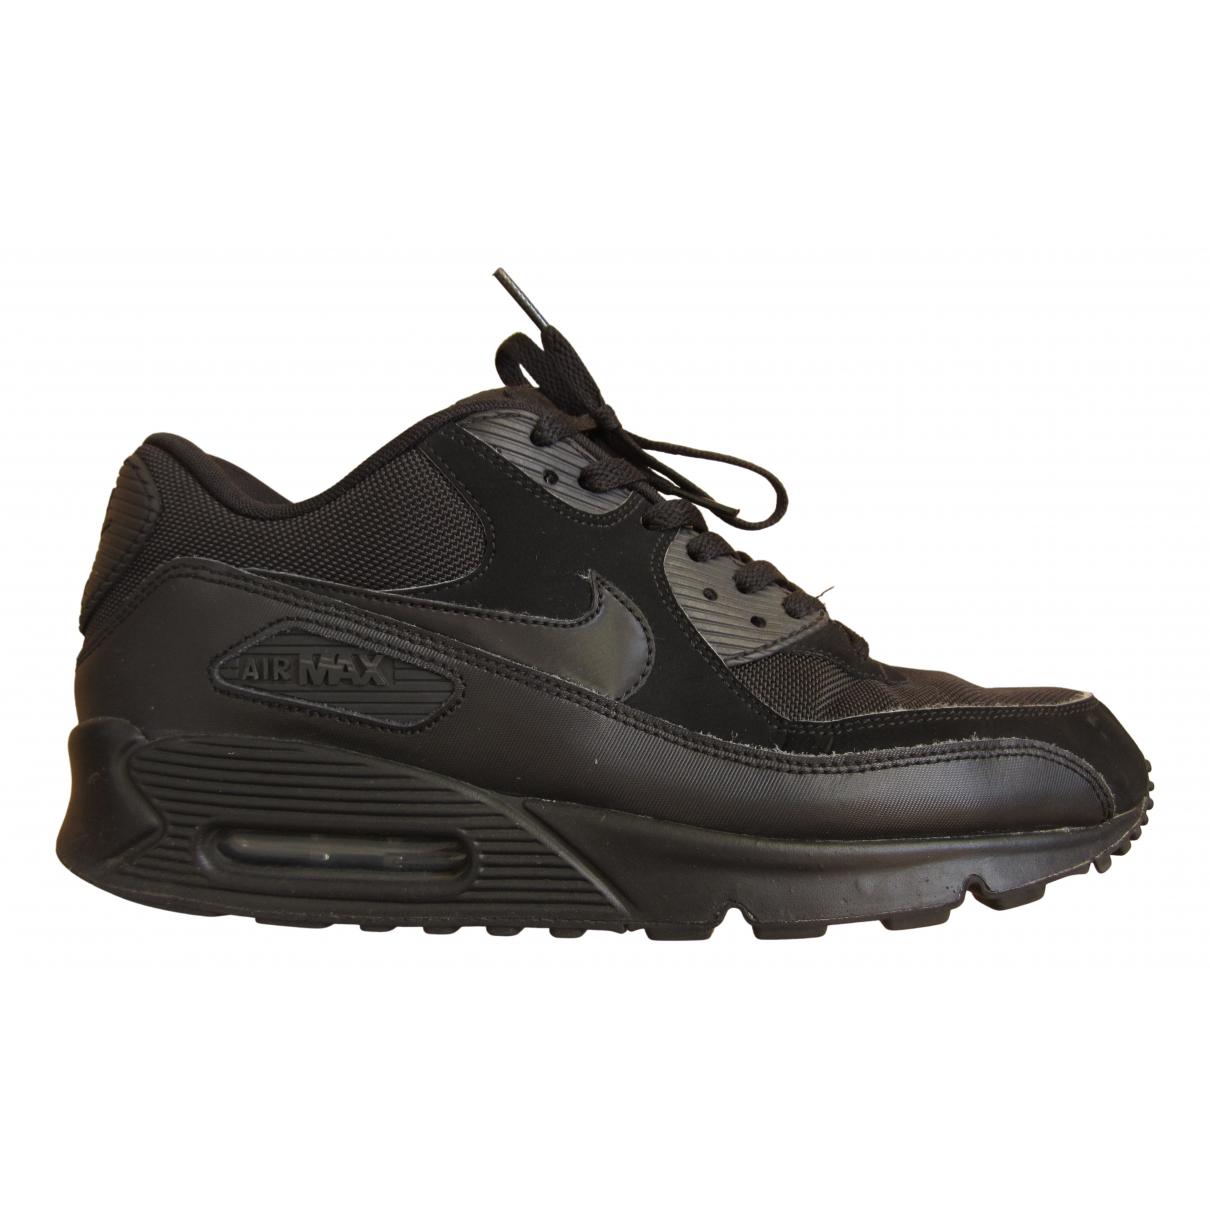 Nike Air Max 90 Black Cloth Trainers for Men 11 UK